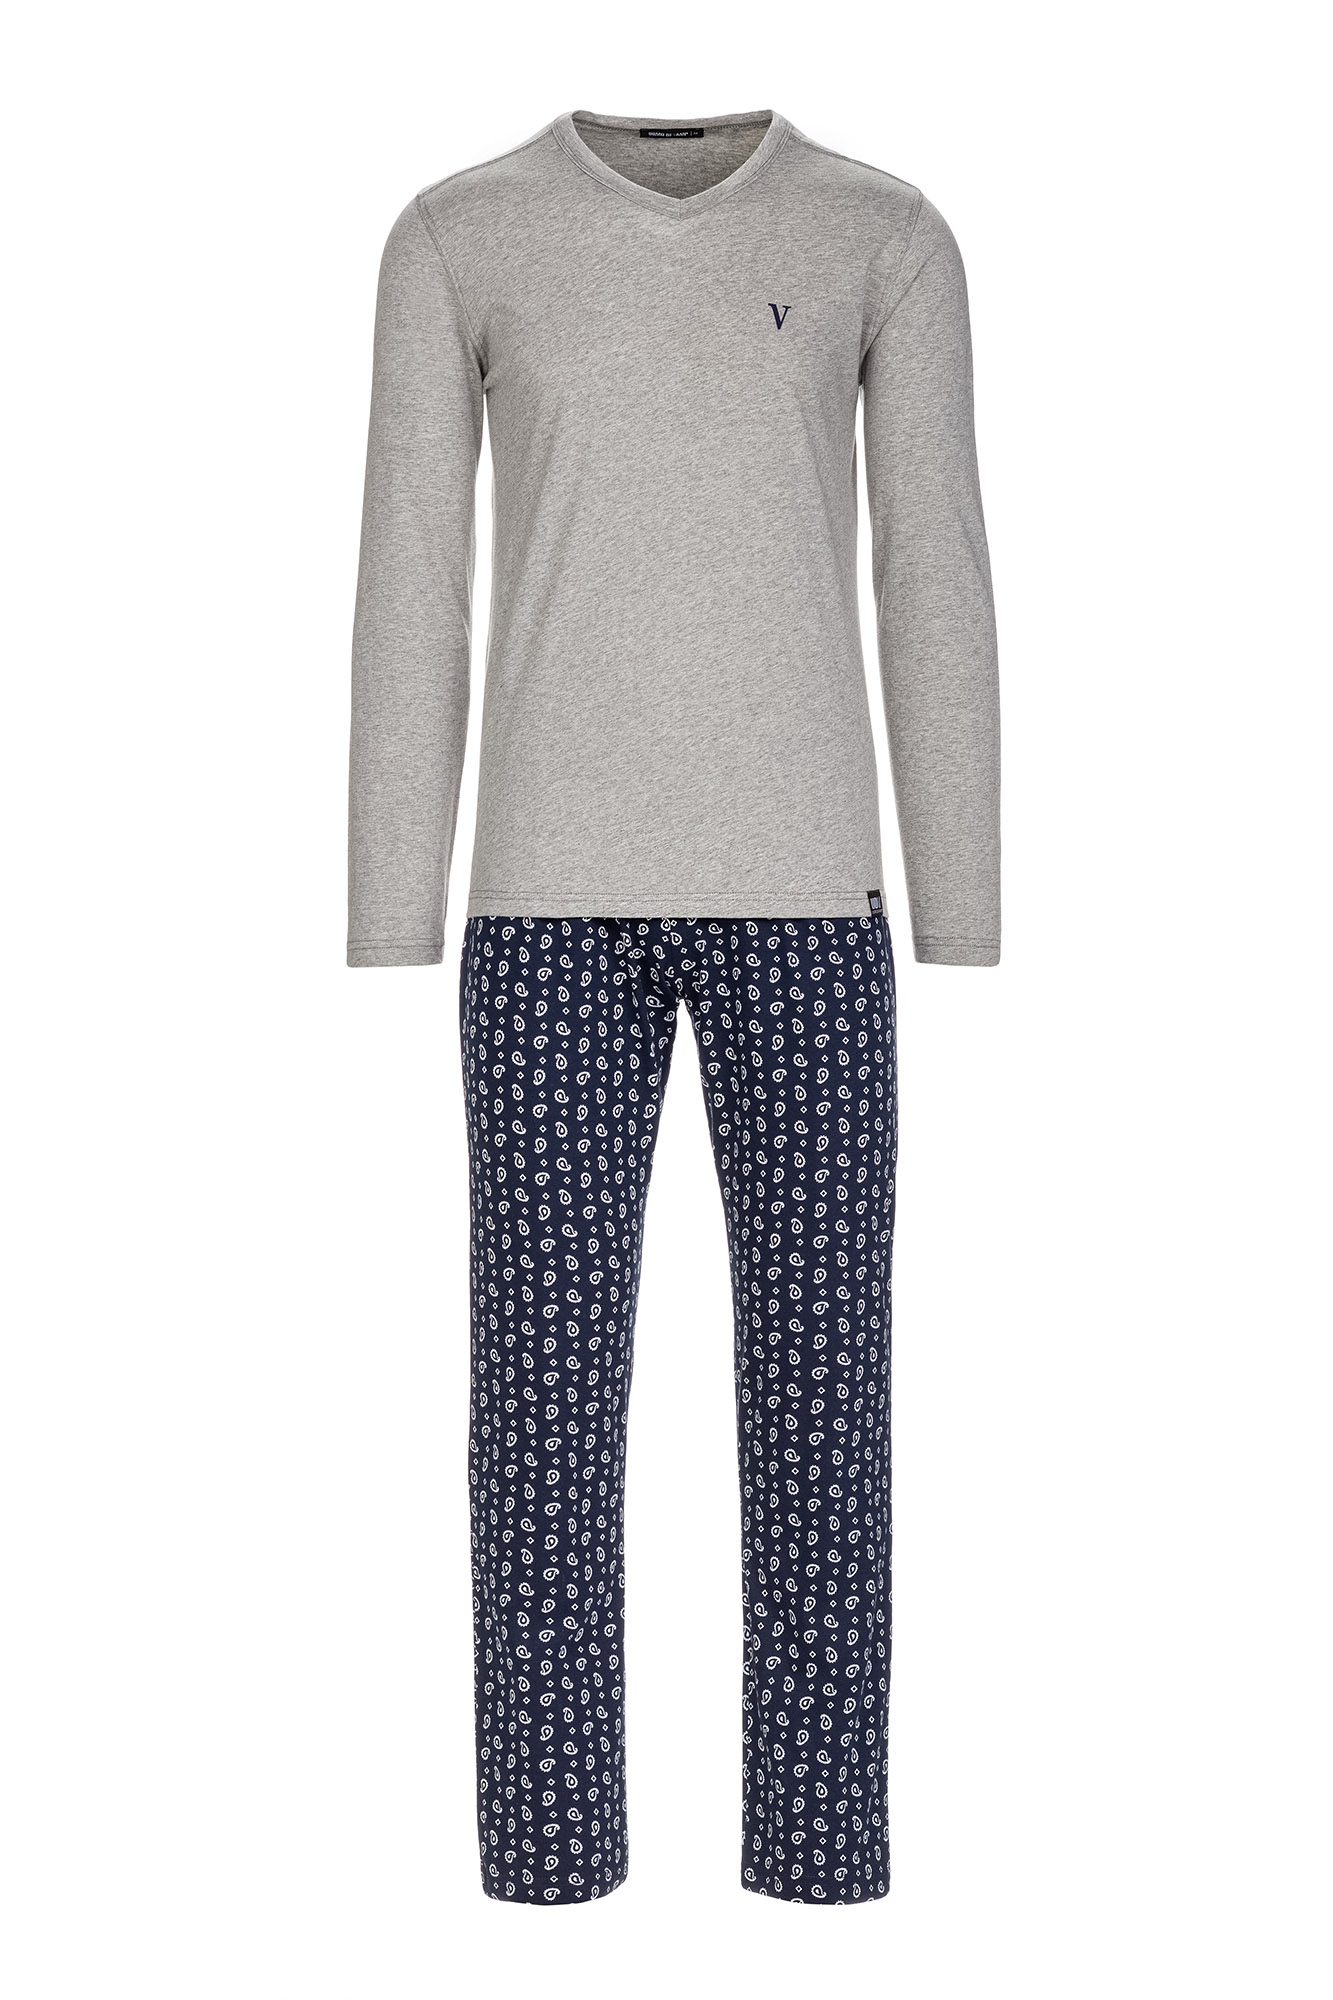 Vamp - Pohodlné pánske pyžamo 13655 - Vamp gray melange s